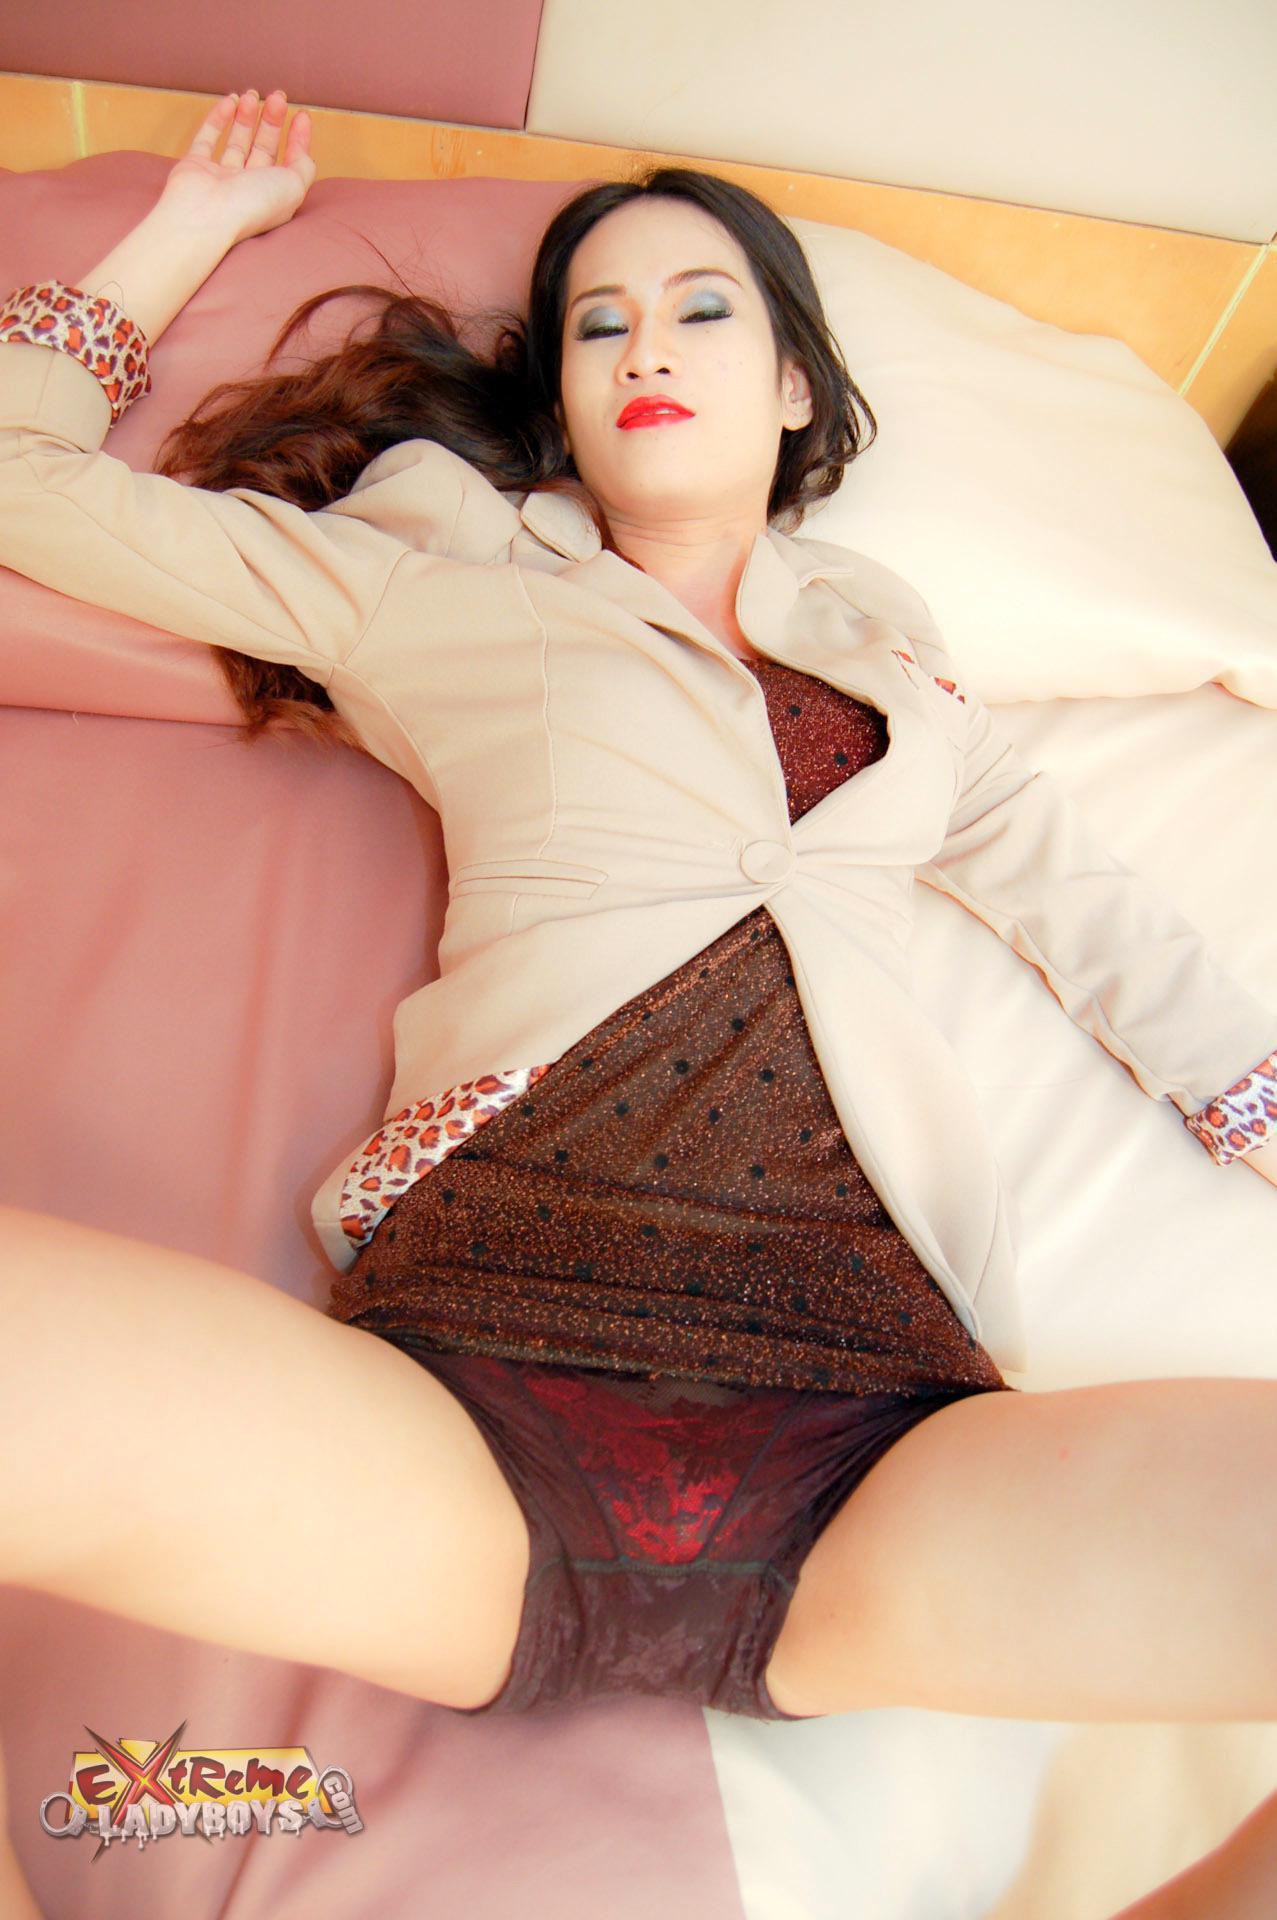 Getting A Amazing Deep Throat Blow Job From A Flirtatious Thai Ladyboy Prostitute